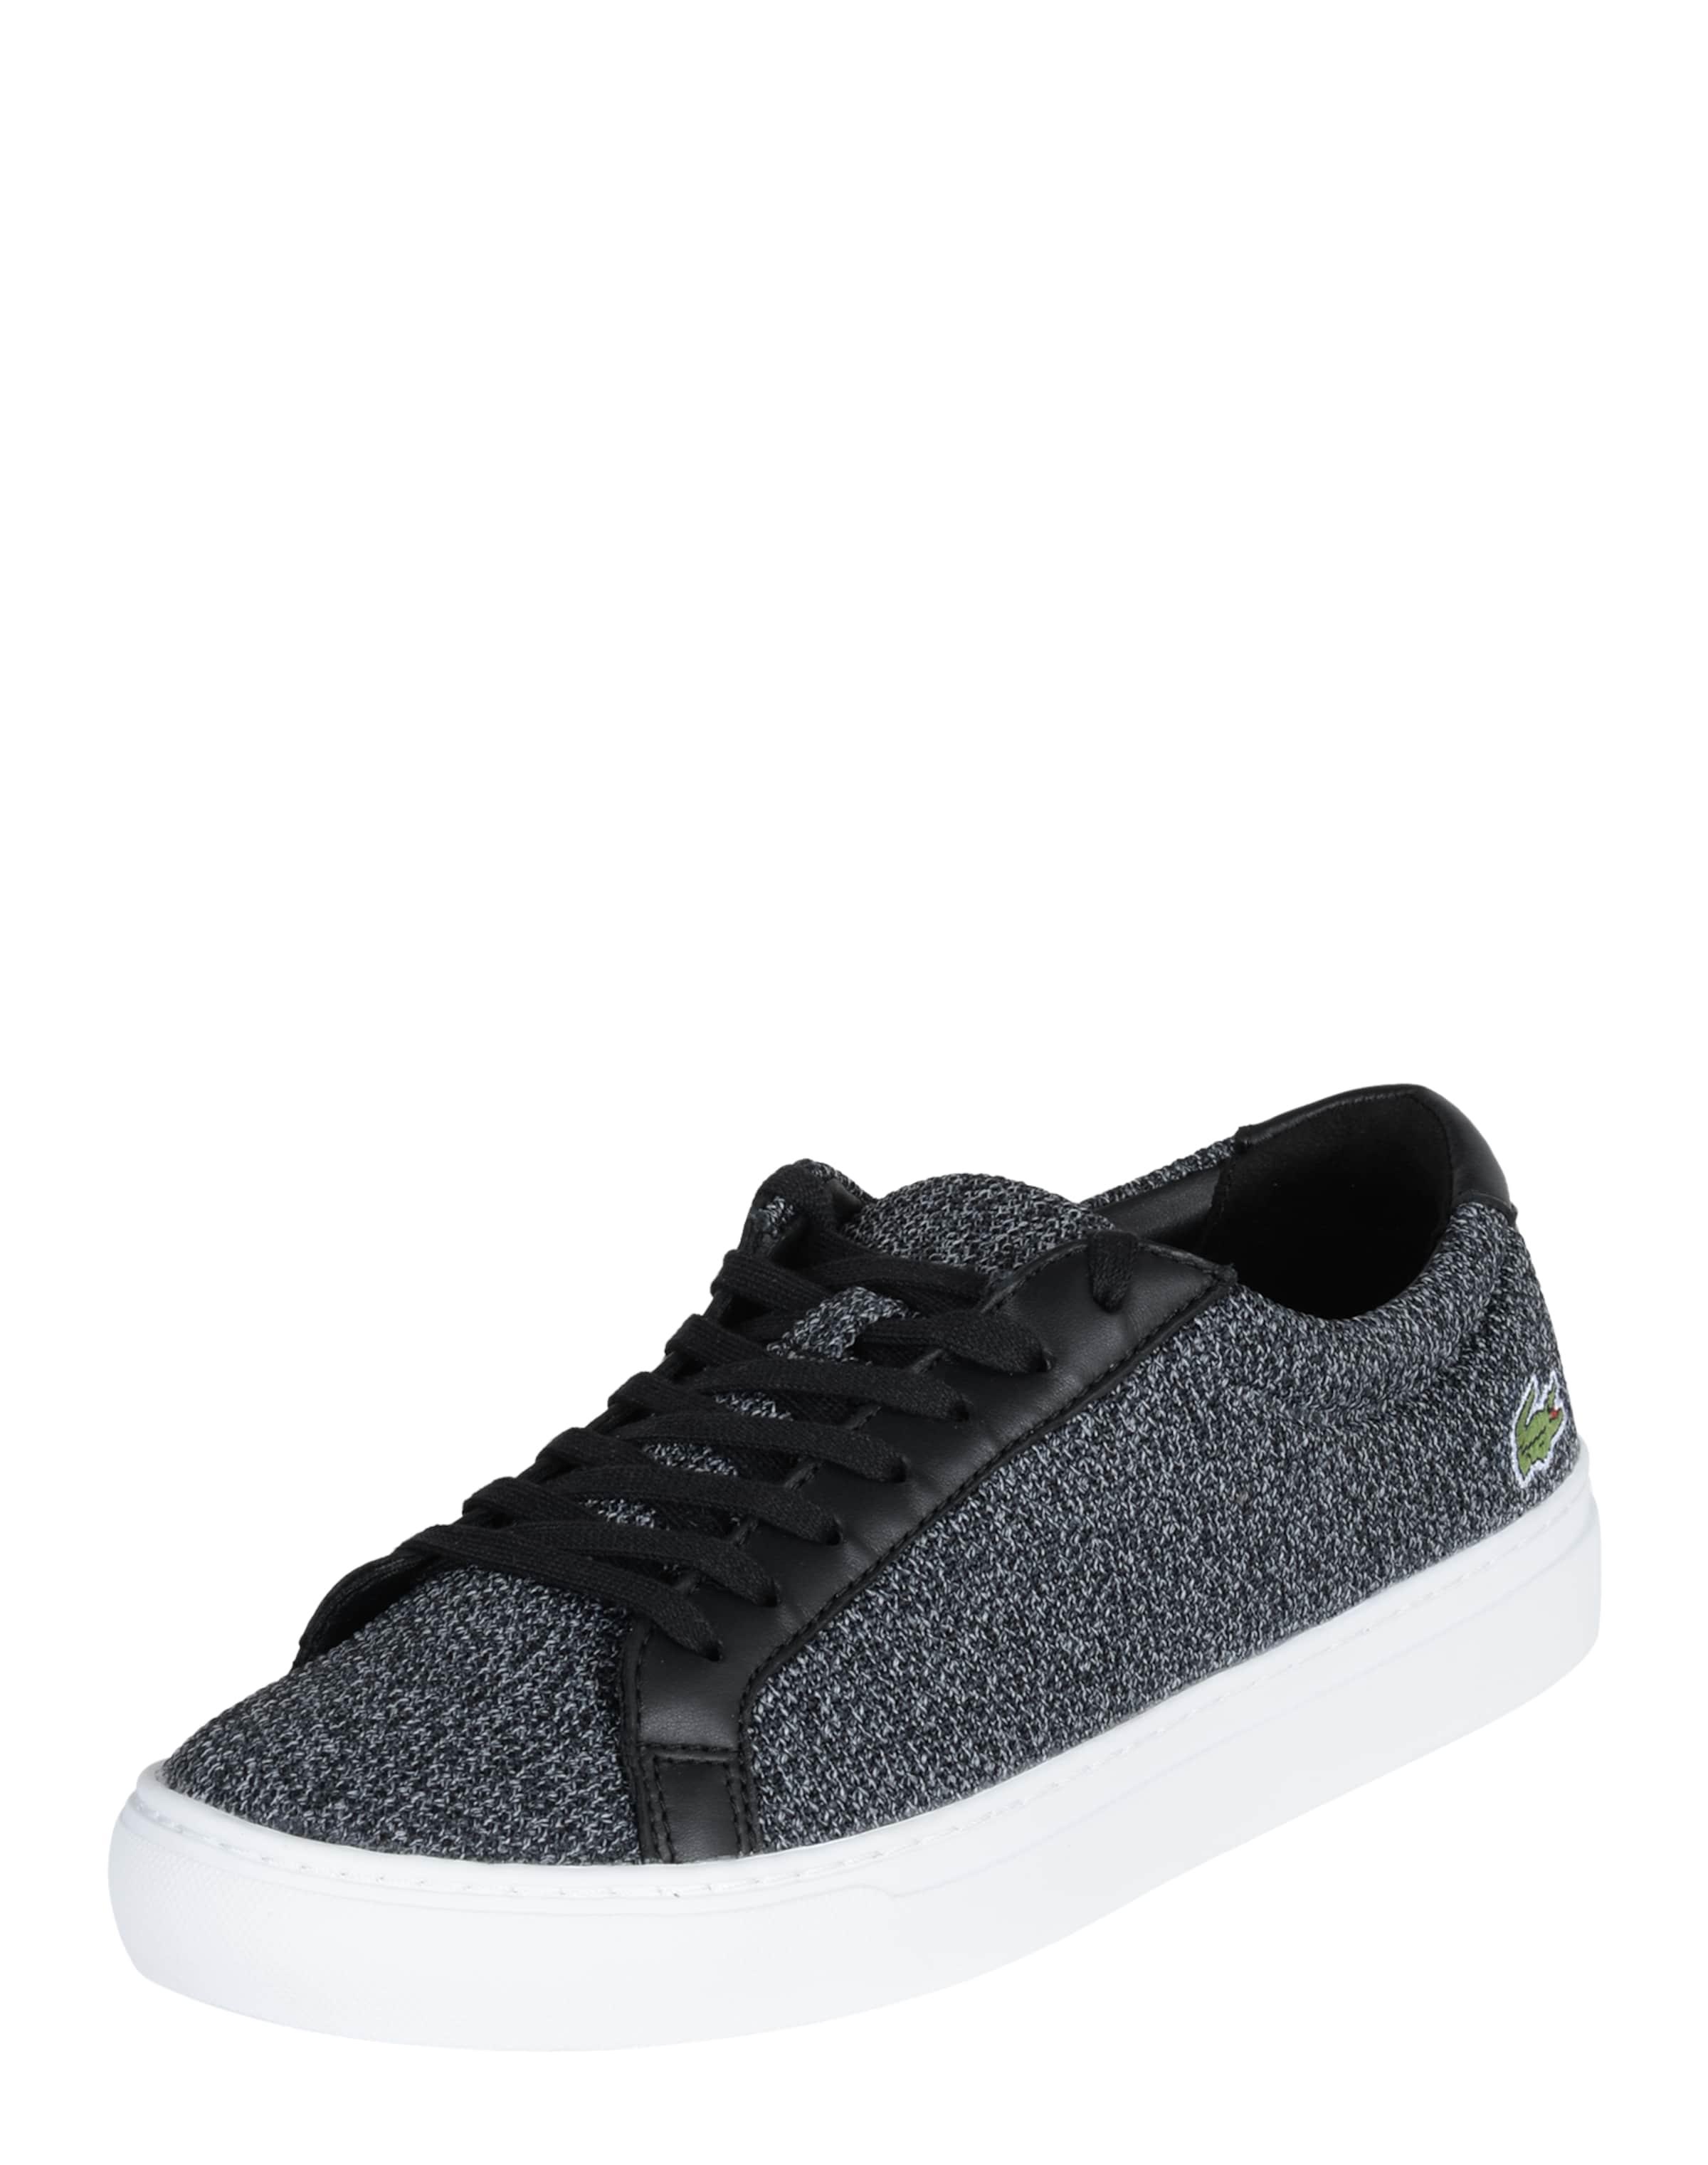 LACOSTE Sneaker Textile Verschleißfeste billige Schuhe